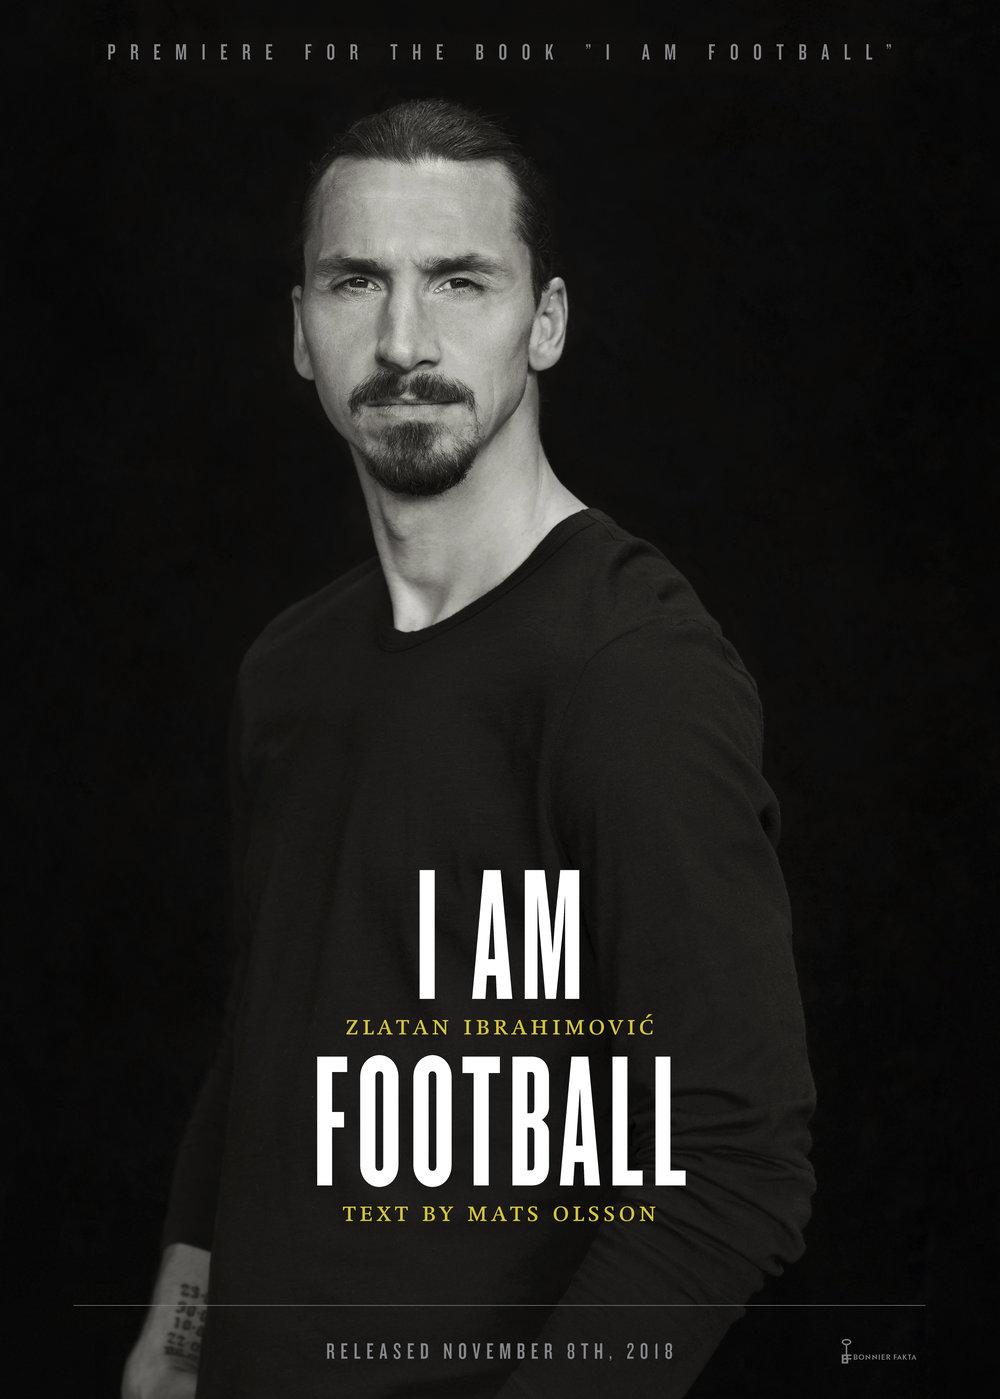 DanielSahlbergZlatanJagarFotboll-2.jpg